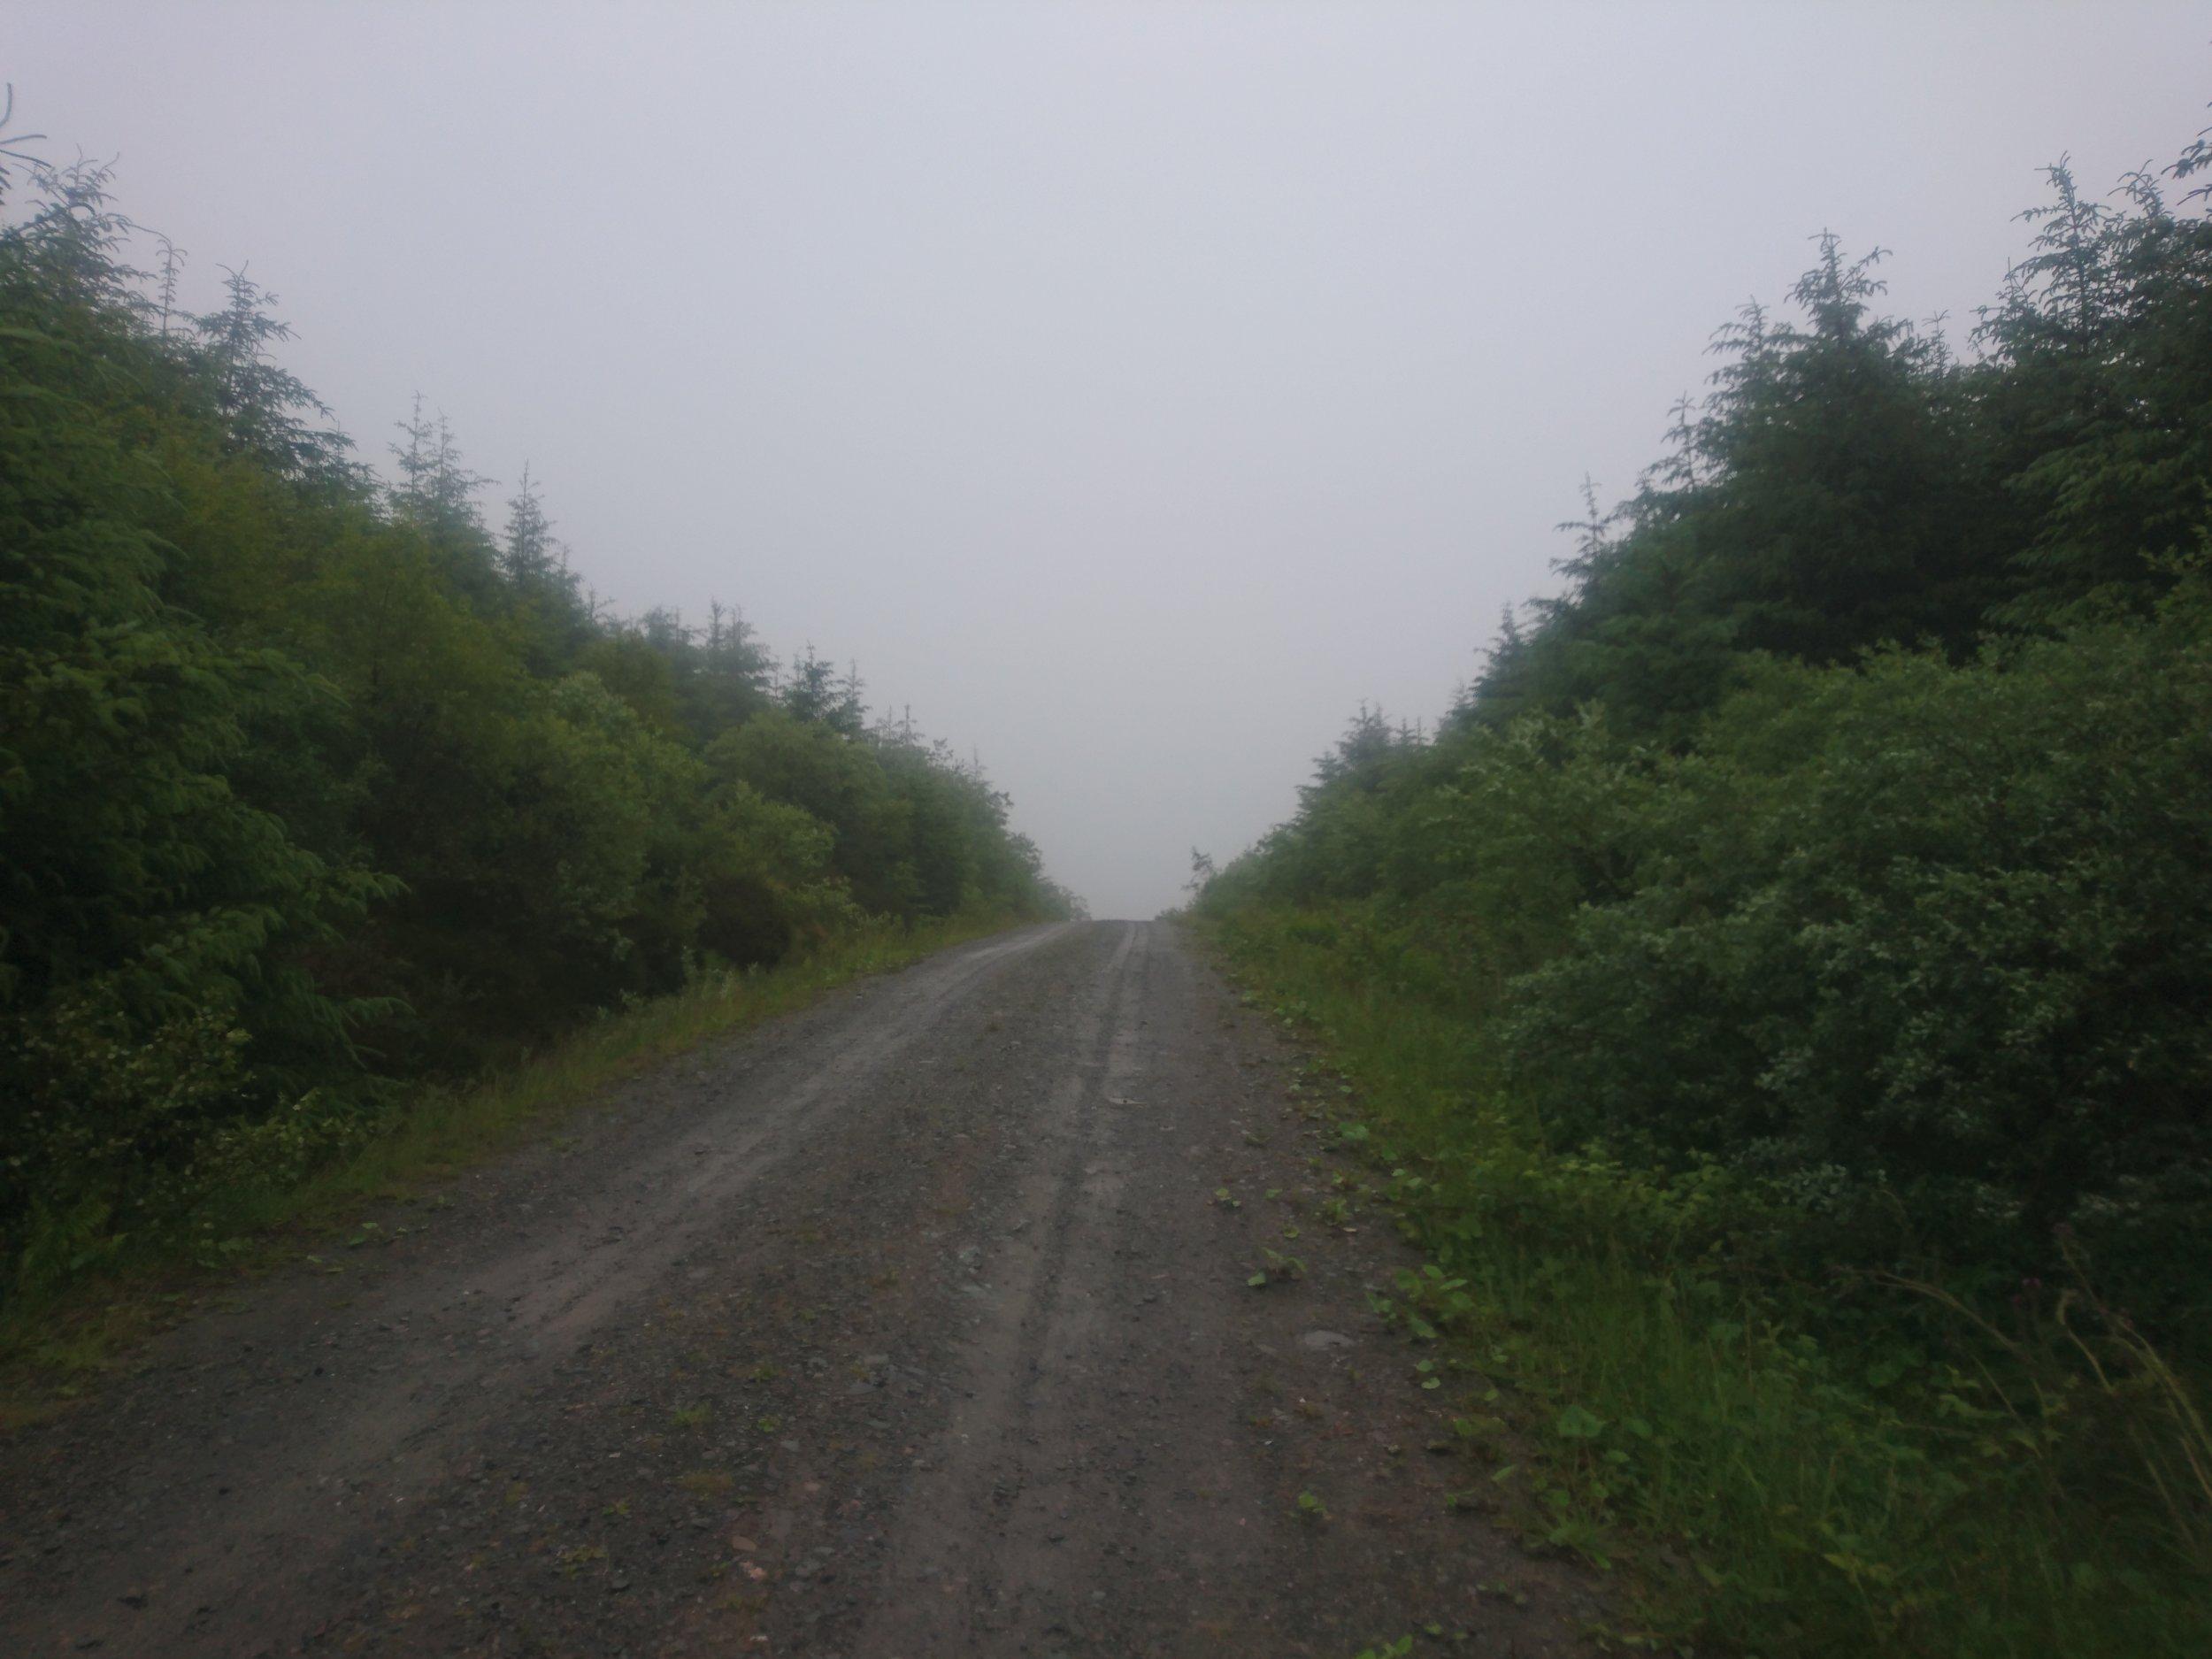 Damp Track through Forest